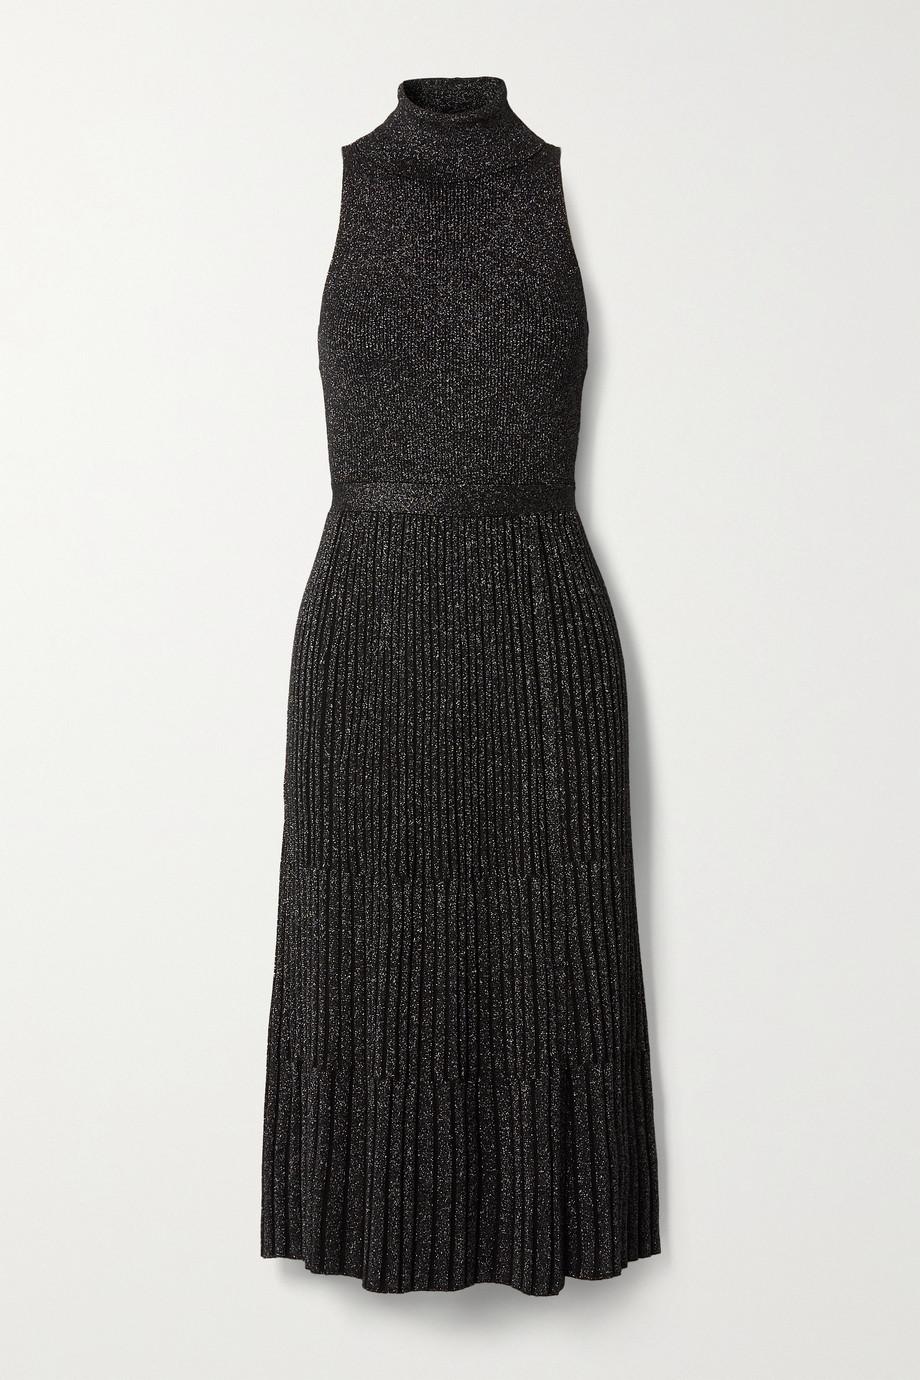 Diane von Furstenberg Lennon ribbed metallic merino wool-blend midi dress